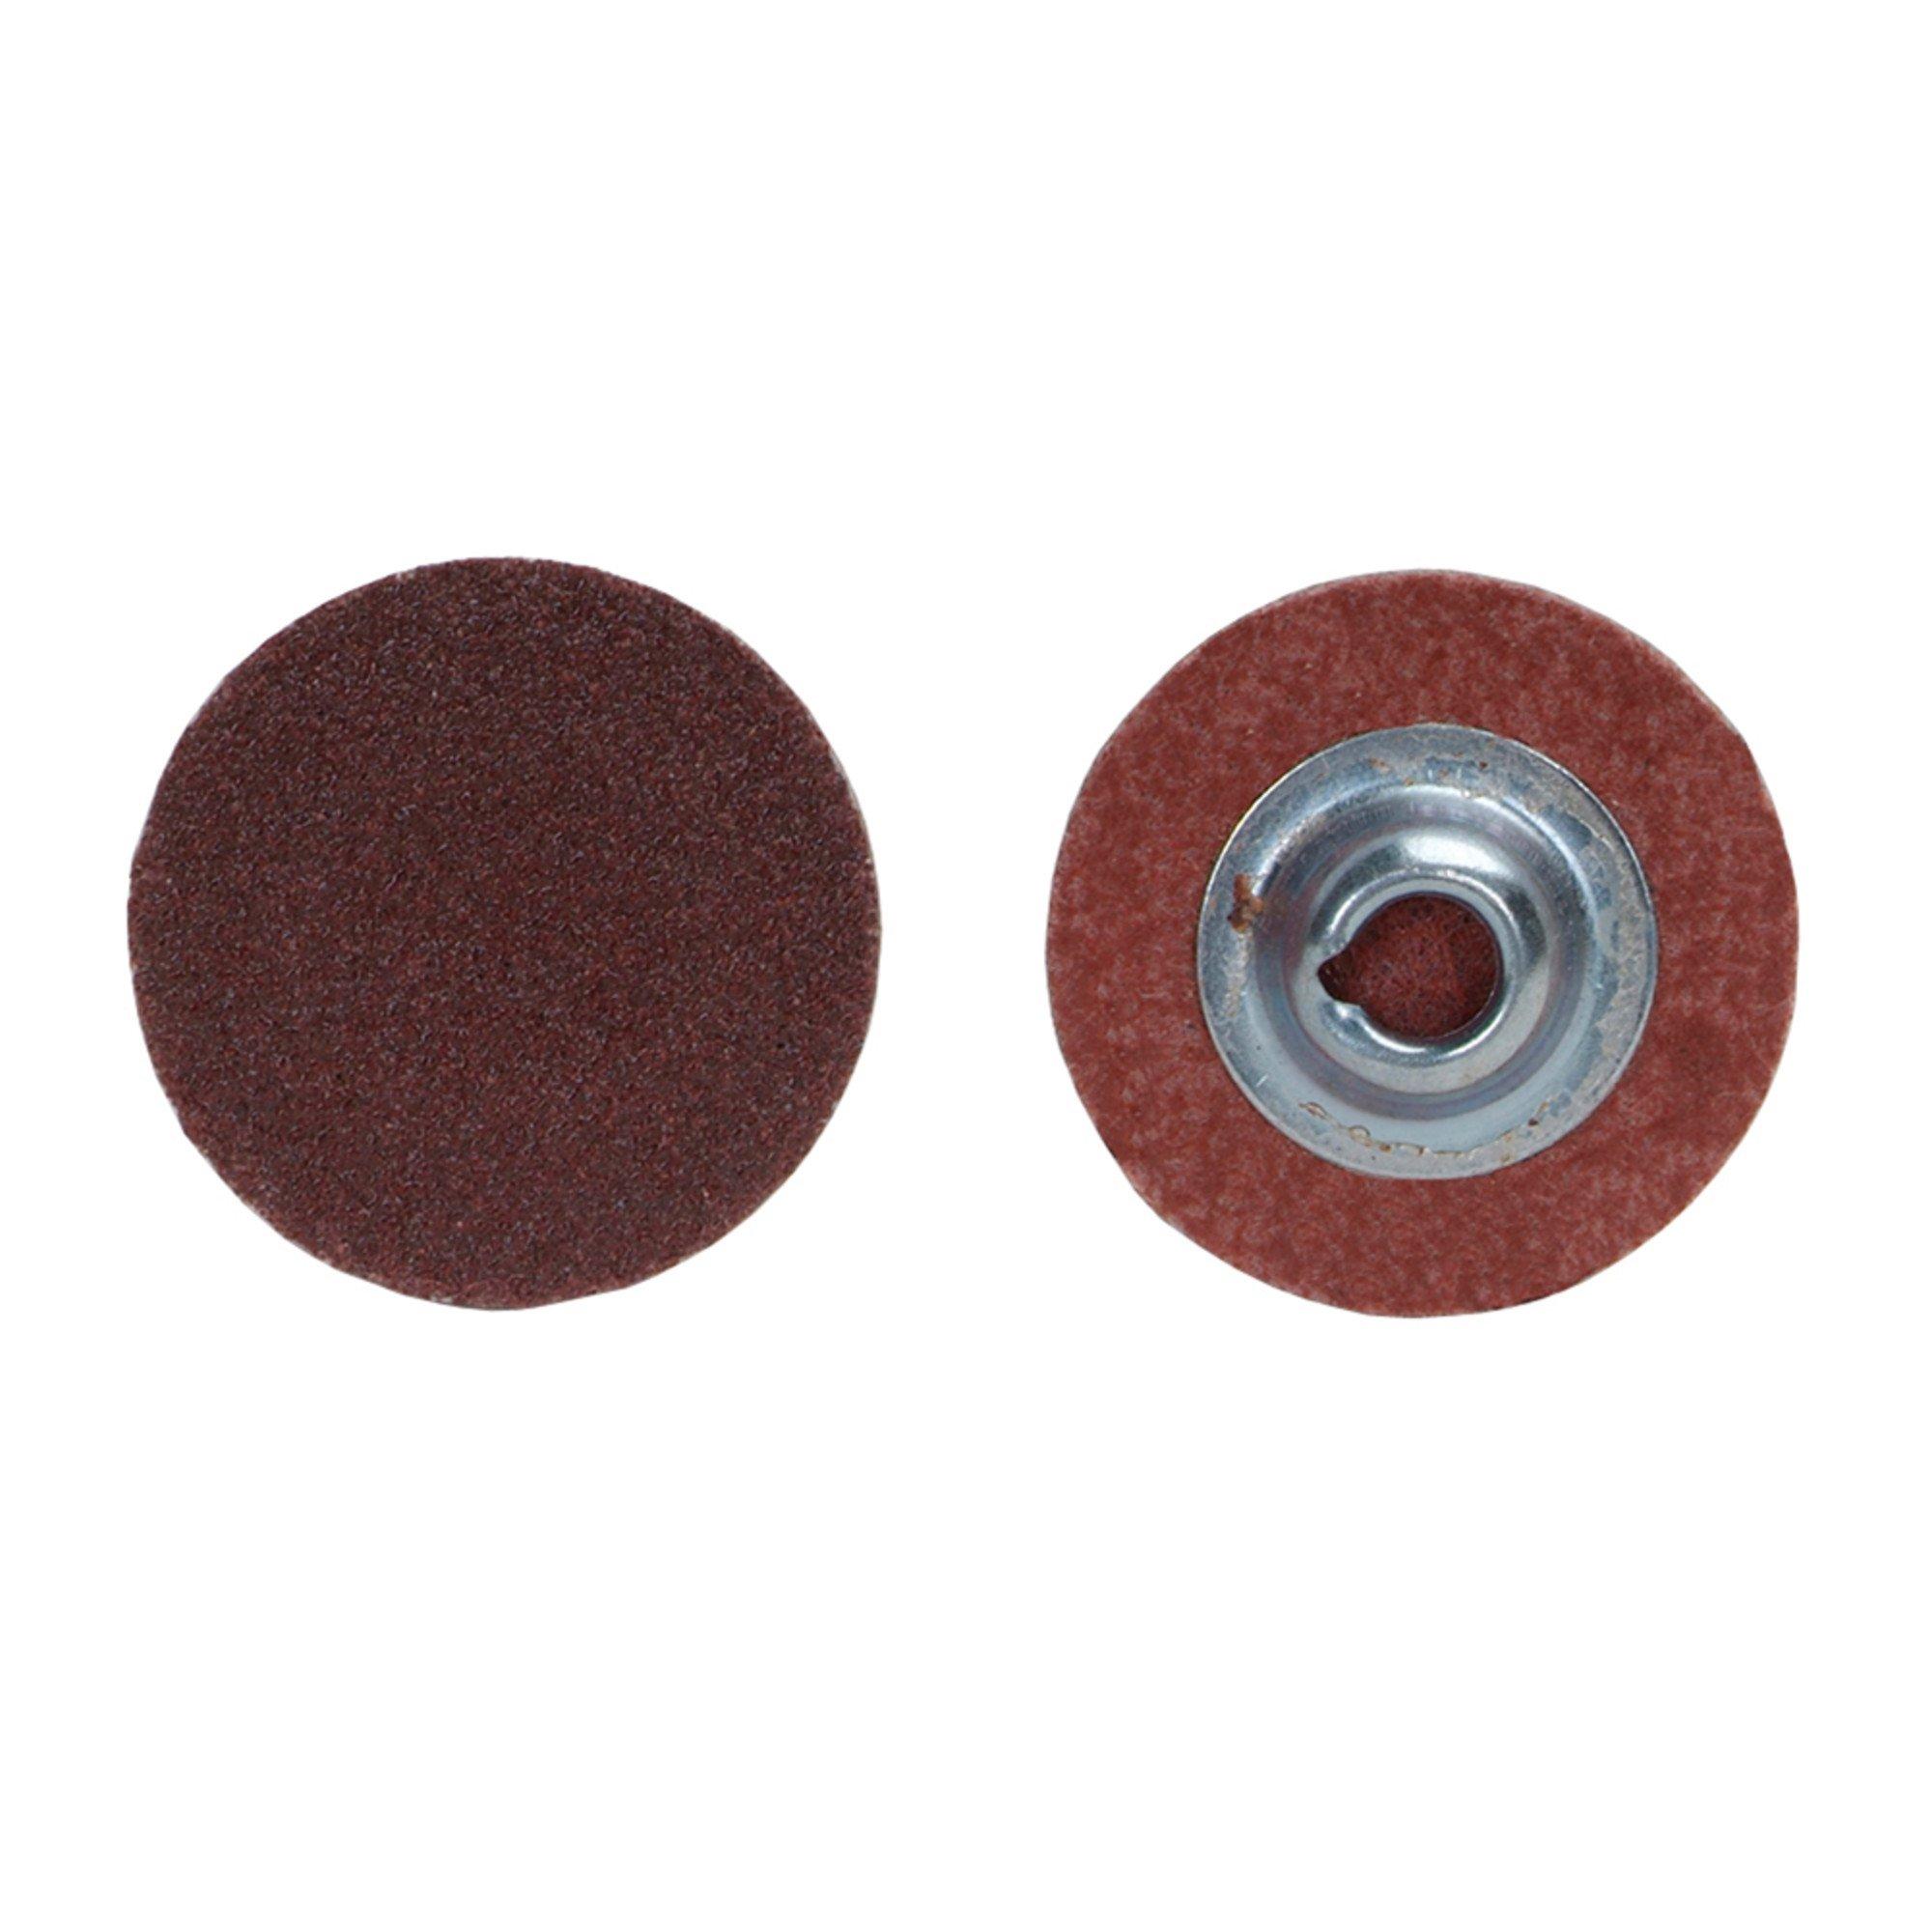 Norton R228 Metalite Speed-Lok Abrasive Disc, Cloth Backing, TS, Aluminum Oxide, 2'' Diameter, Grit 50   (Pack of 100) by Norton Abrasives - St. Gobain